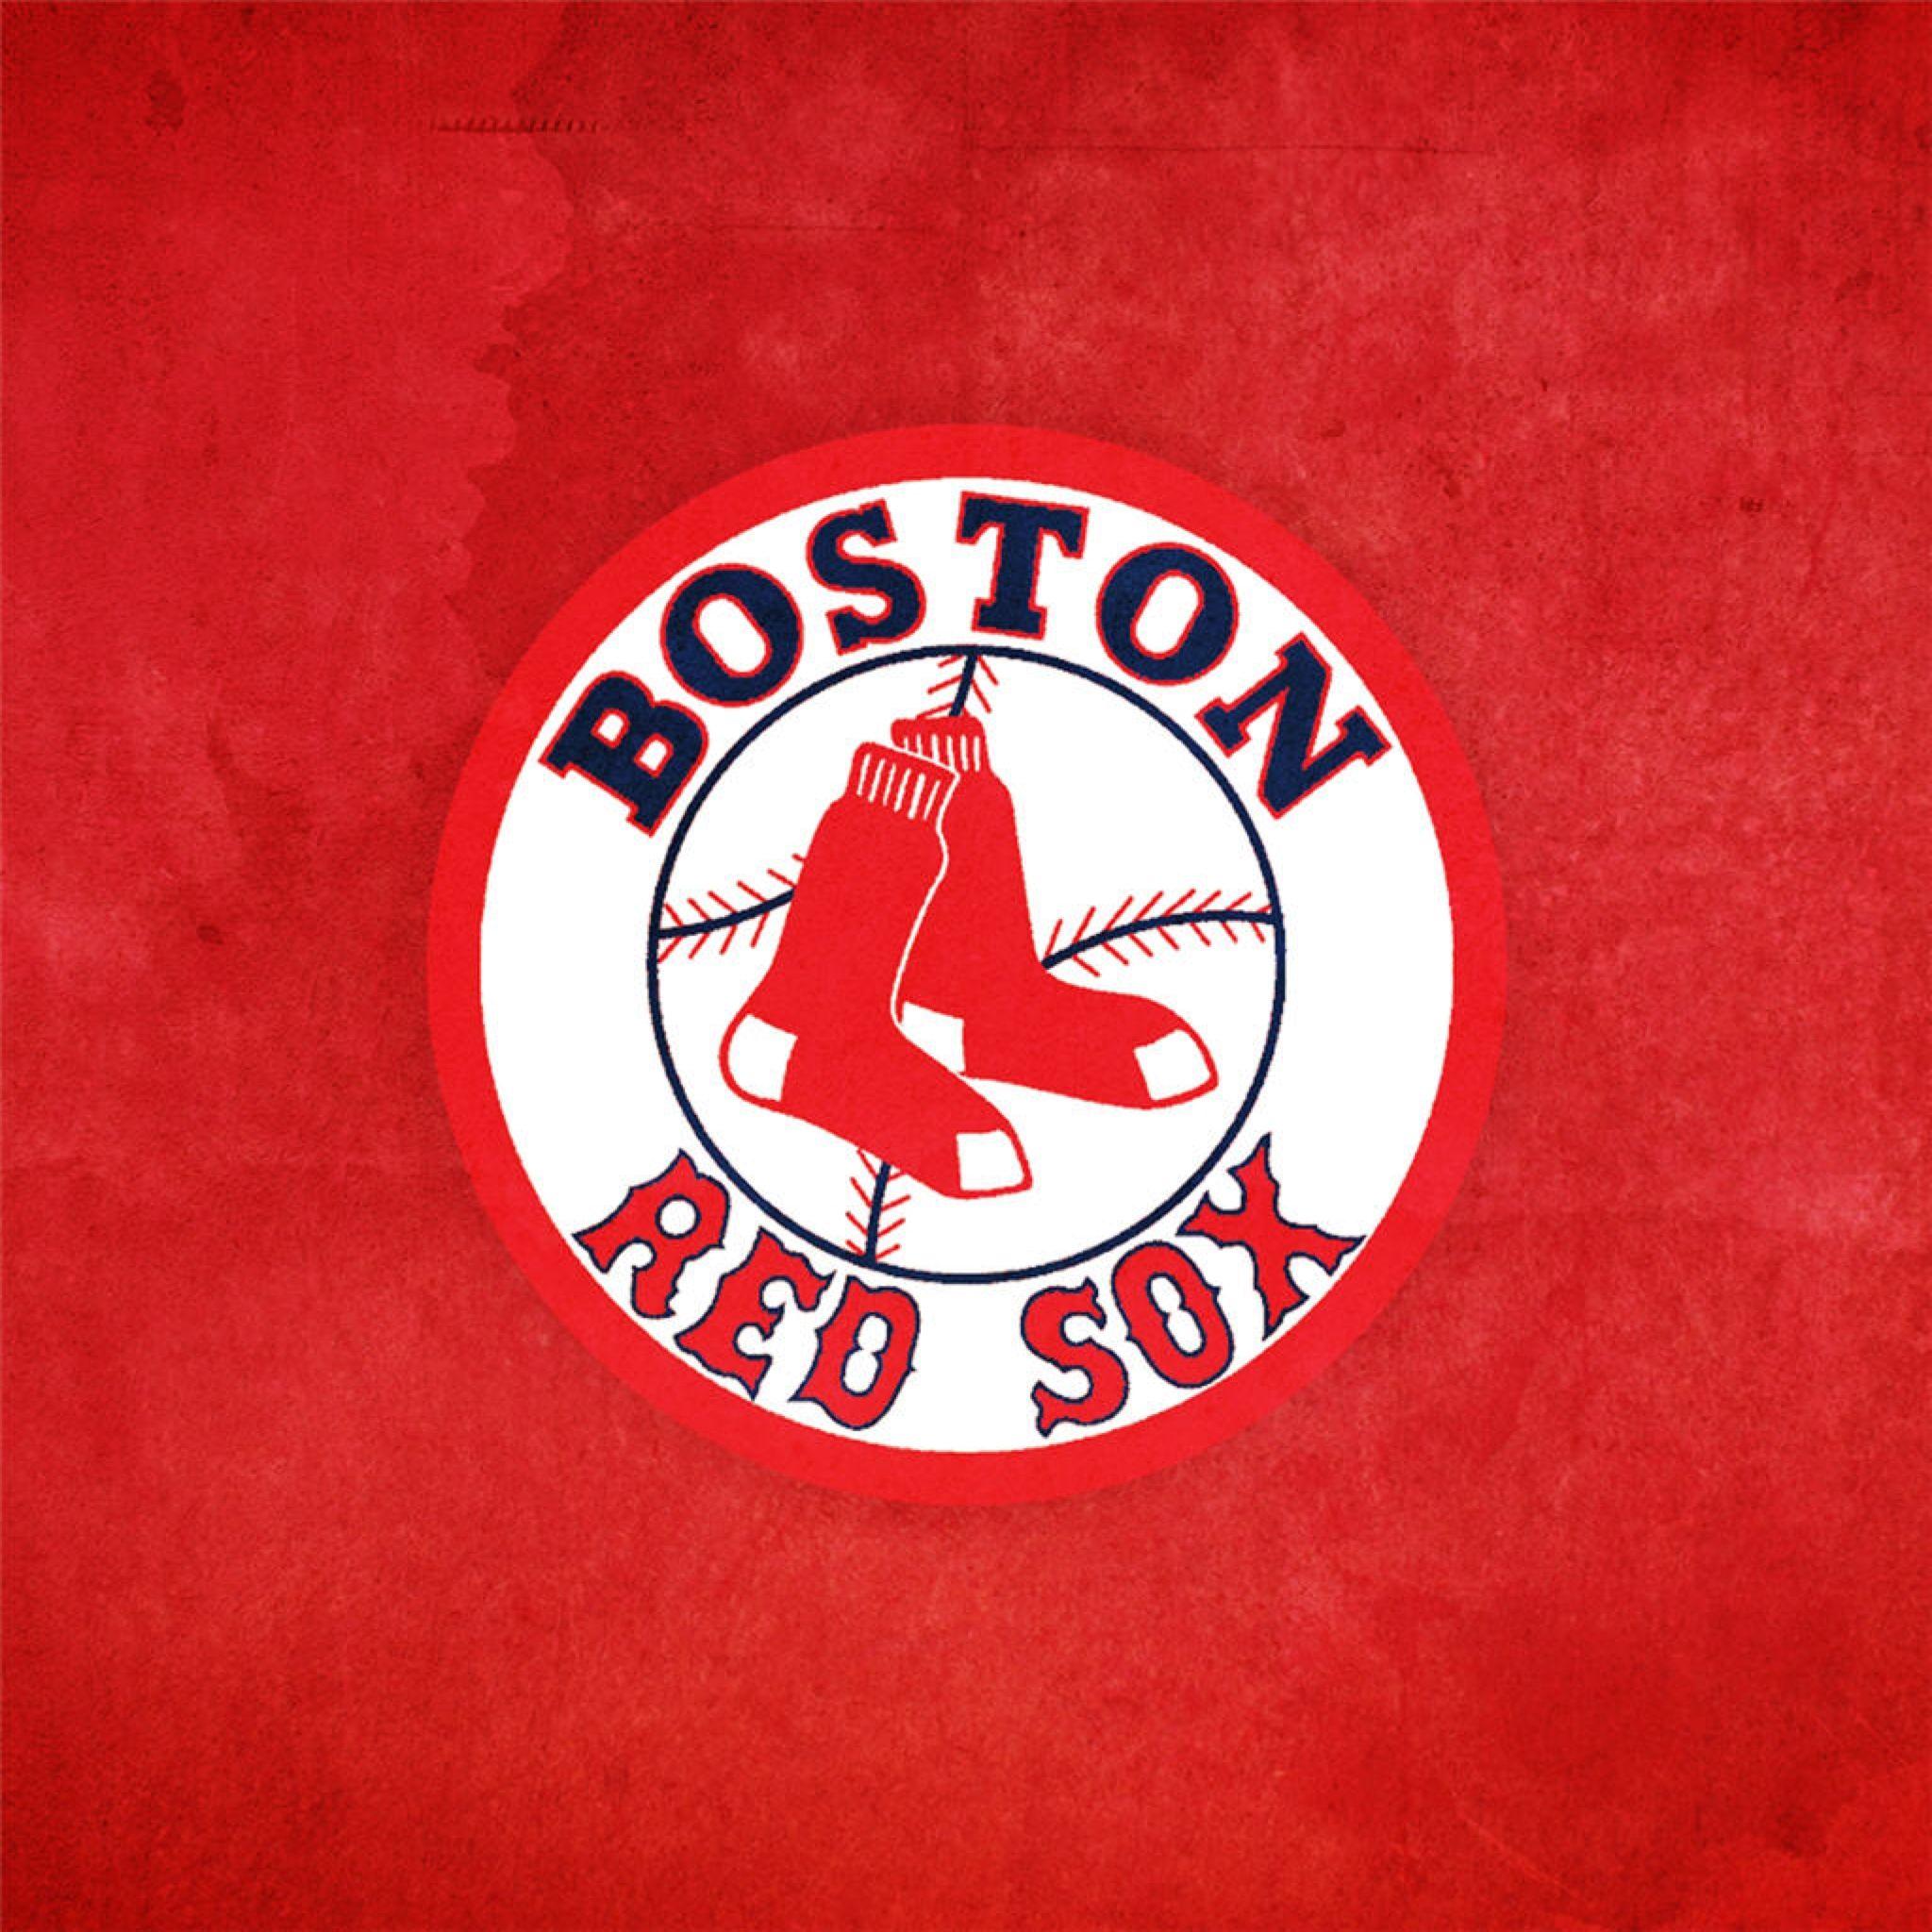 Mobile Boston Red Sox Wallpaper. | Boston Red Sox | Pinterest